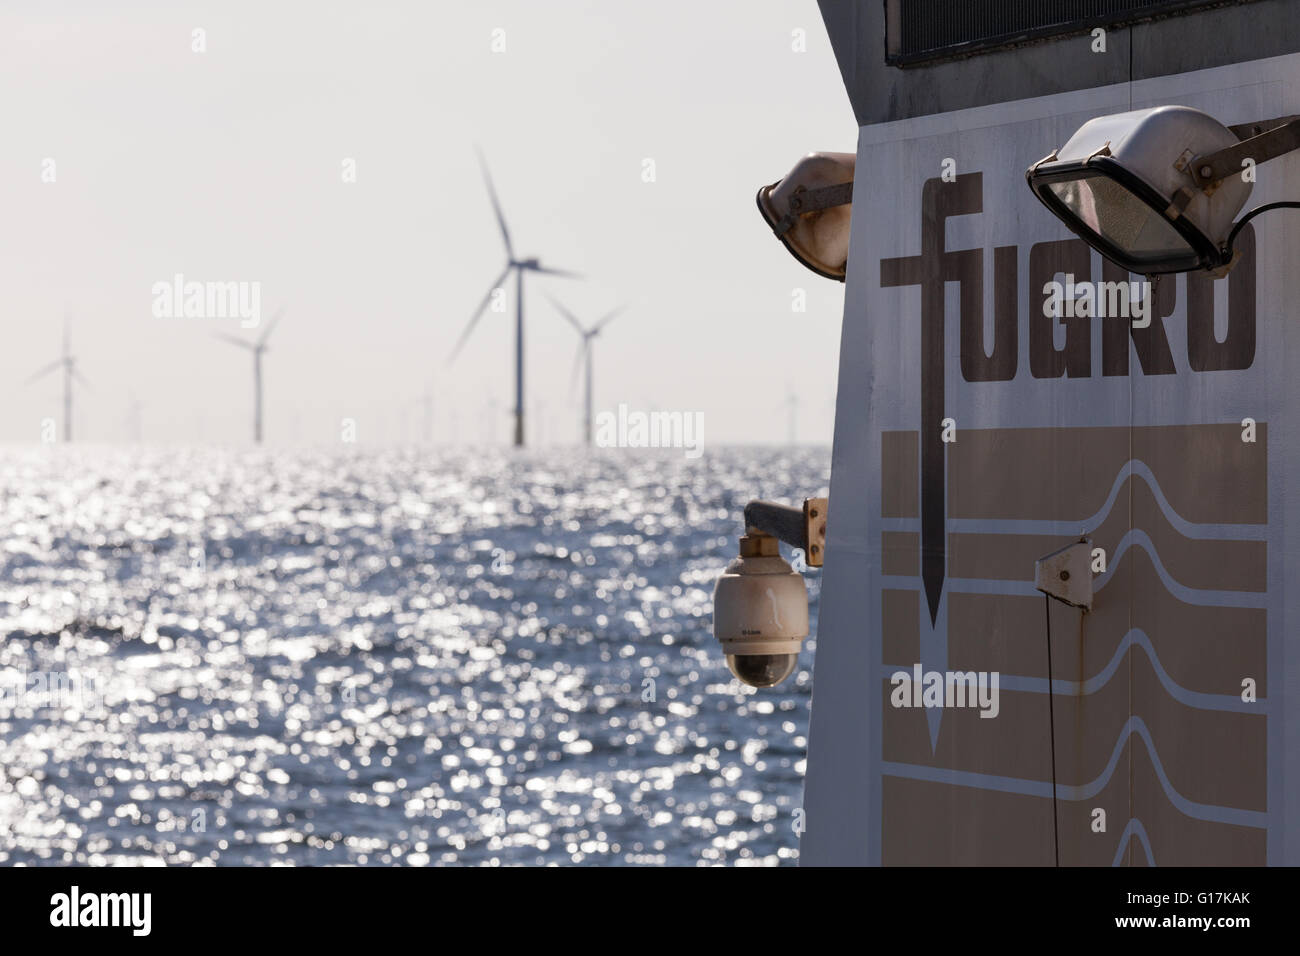 Fugro survey ship, Fugro Helmert working on Walney Offshore Wind Farm off the Cumbrian Coast in the UK - Stock Image